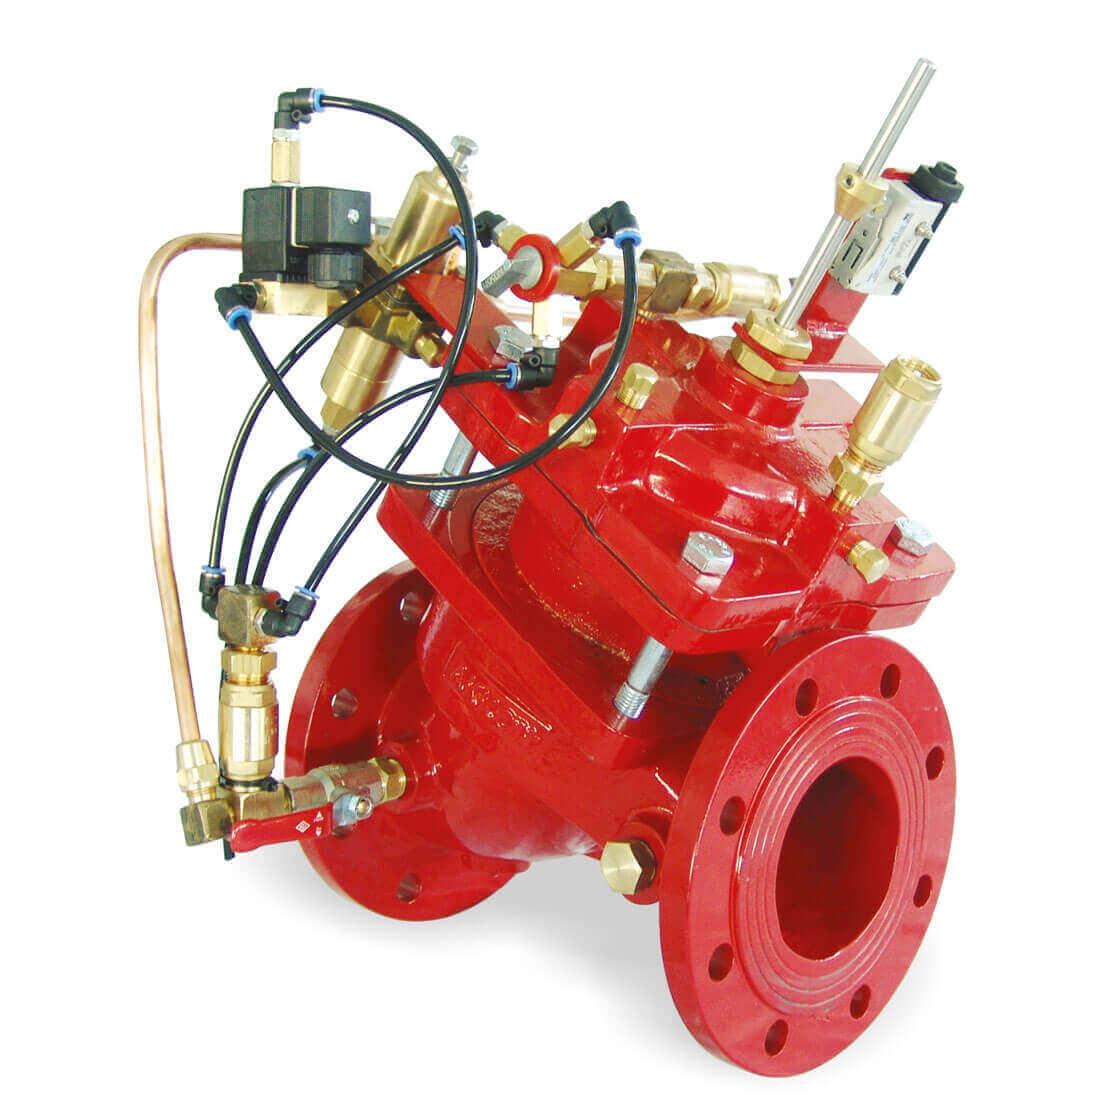 Entrance Pressure Adjustable Pump Control Valve